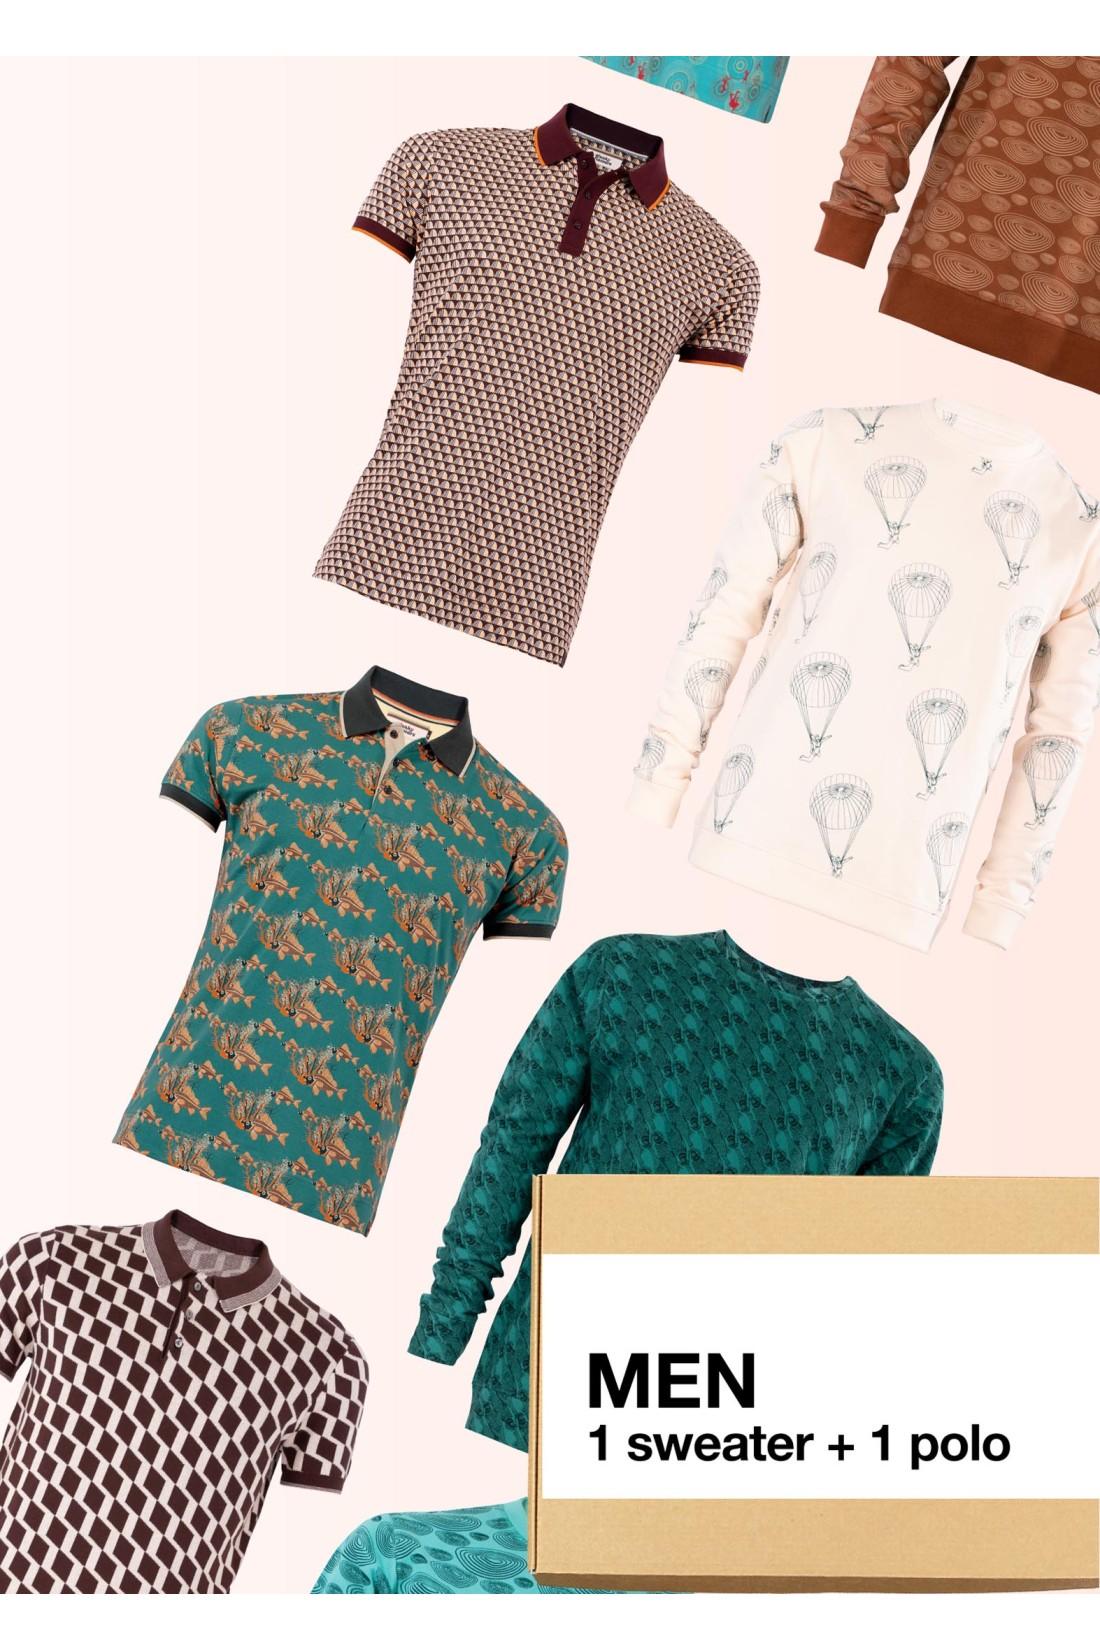 Surprise Box Men - 2 Styles - Sweater + Polo